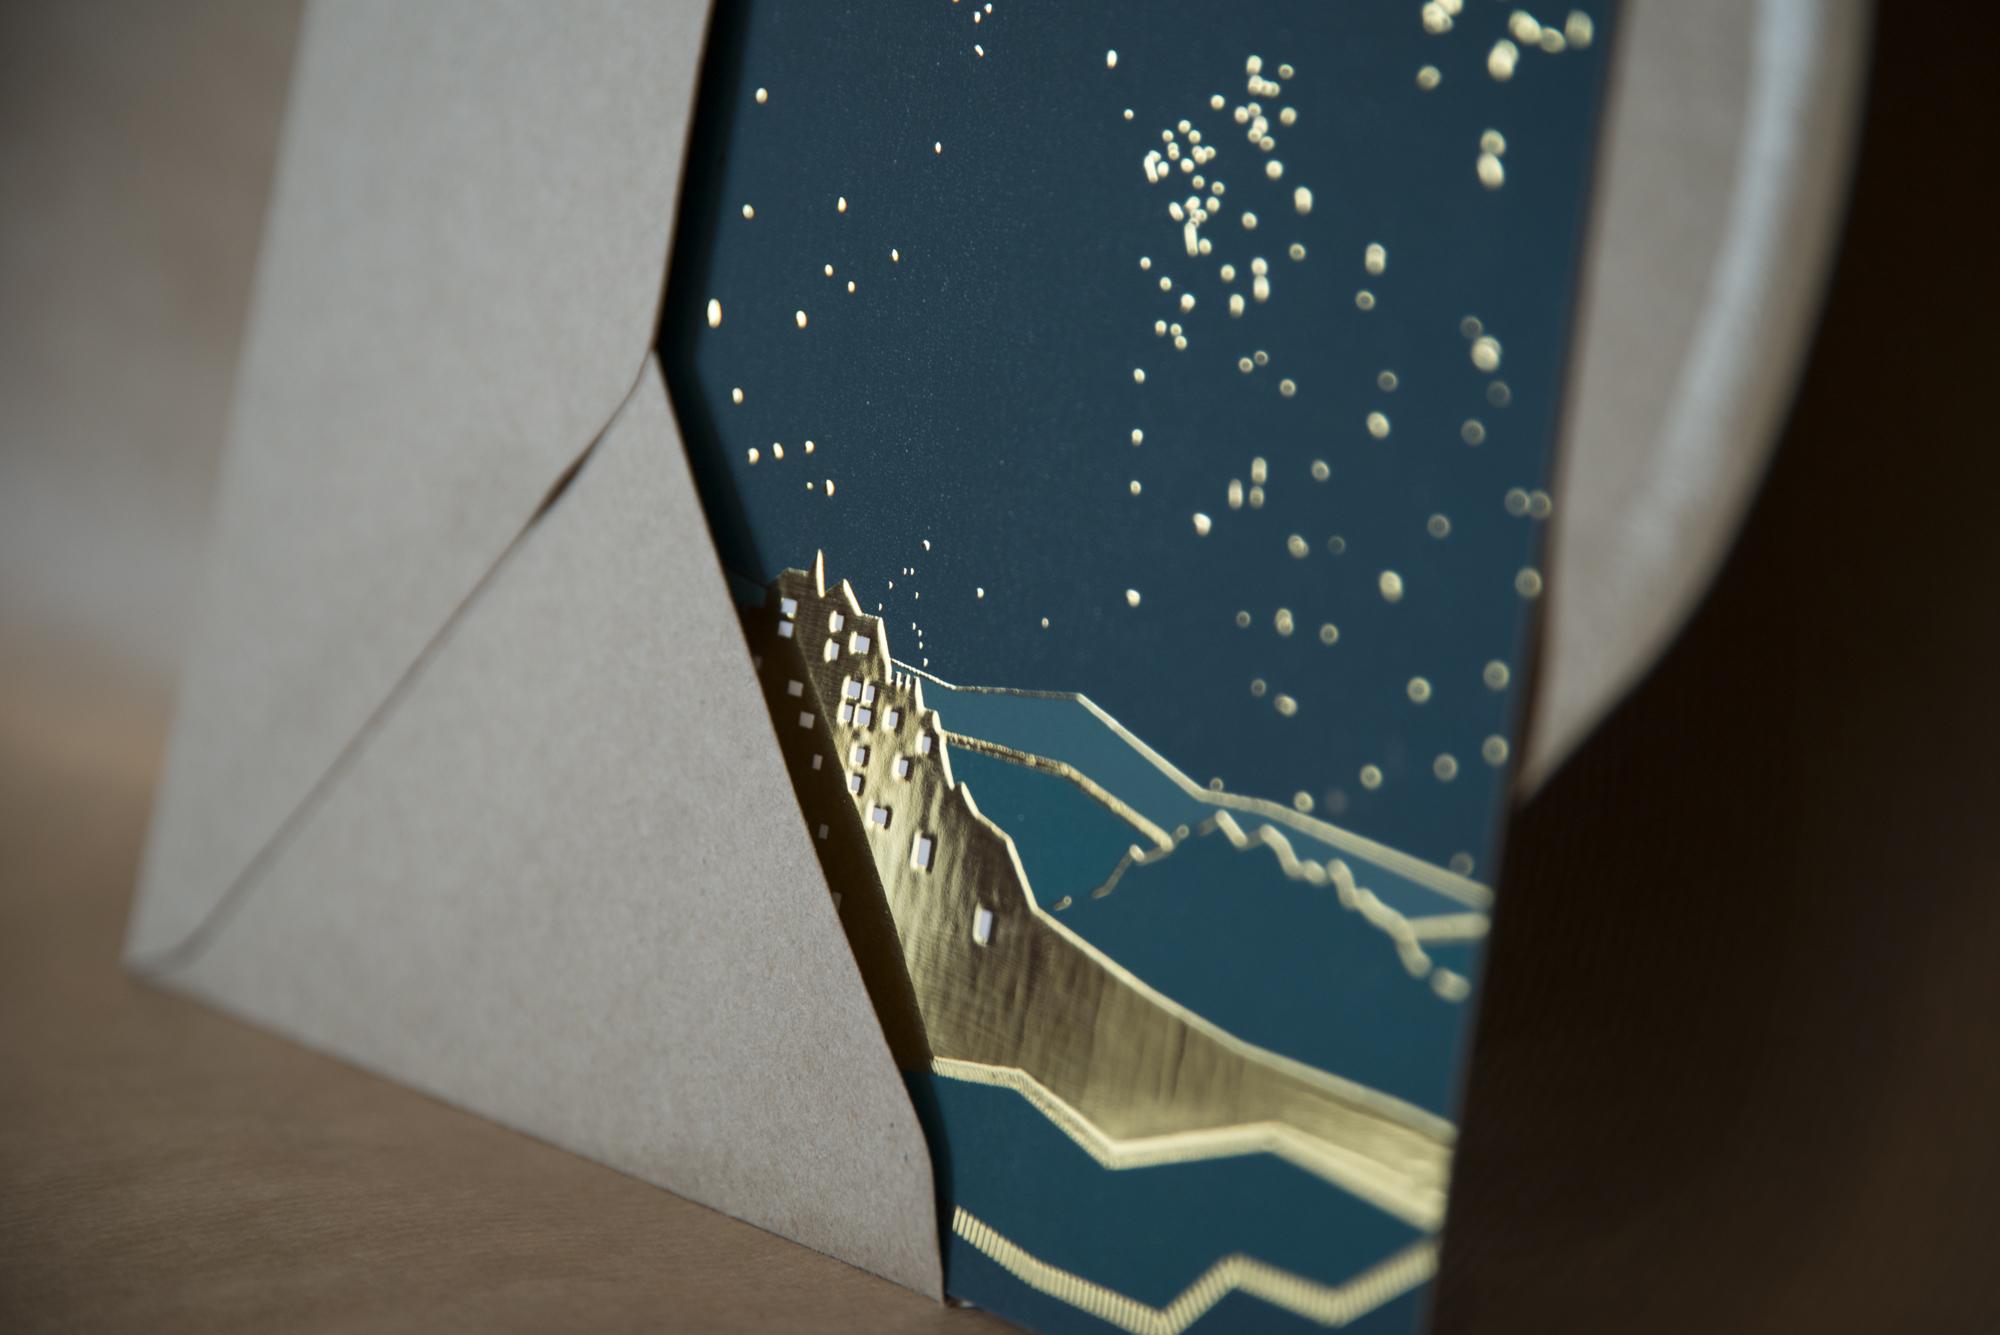 hortense-rossignol-graphisme-angers-carton-unimedia-4